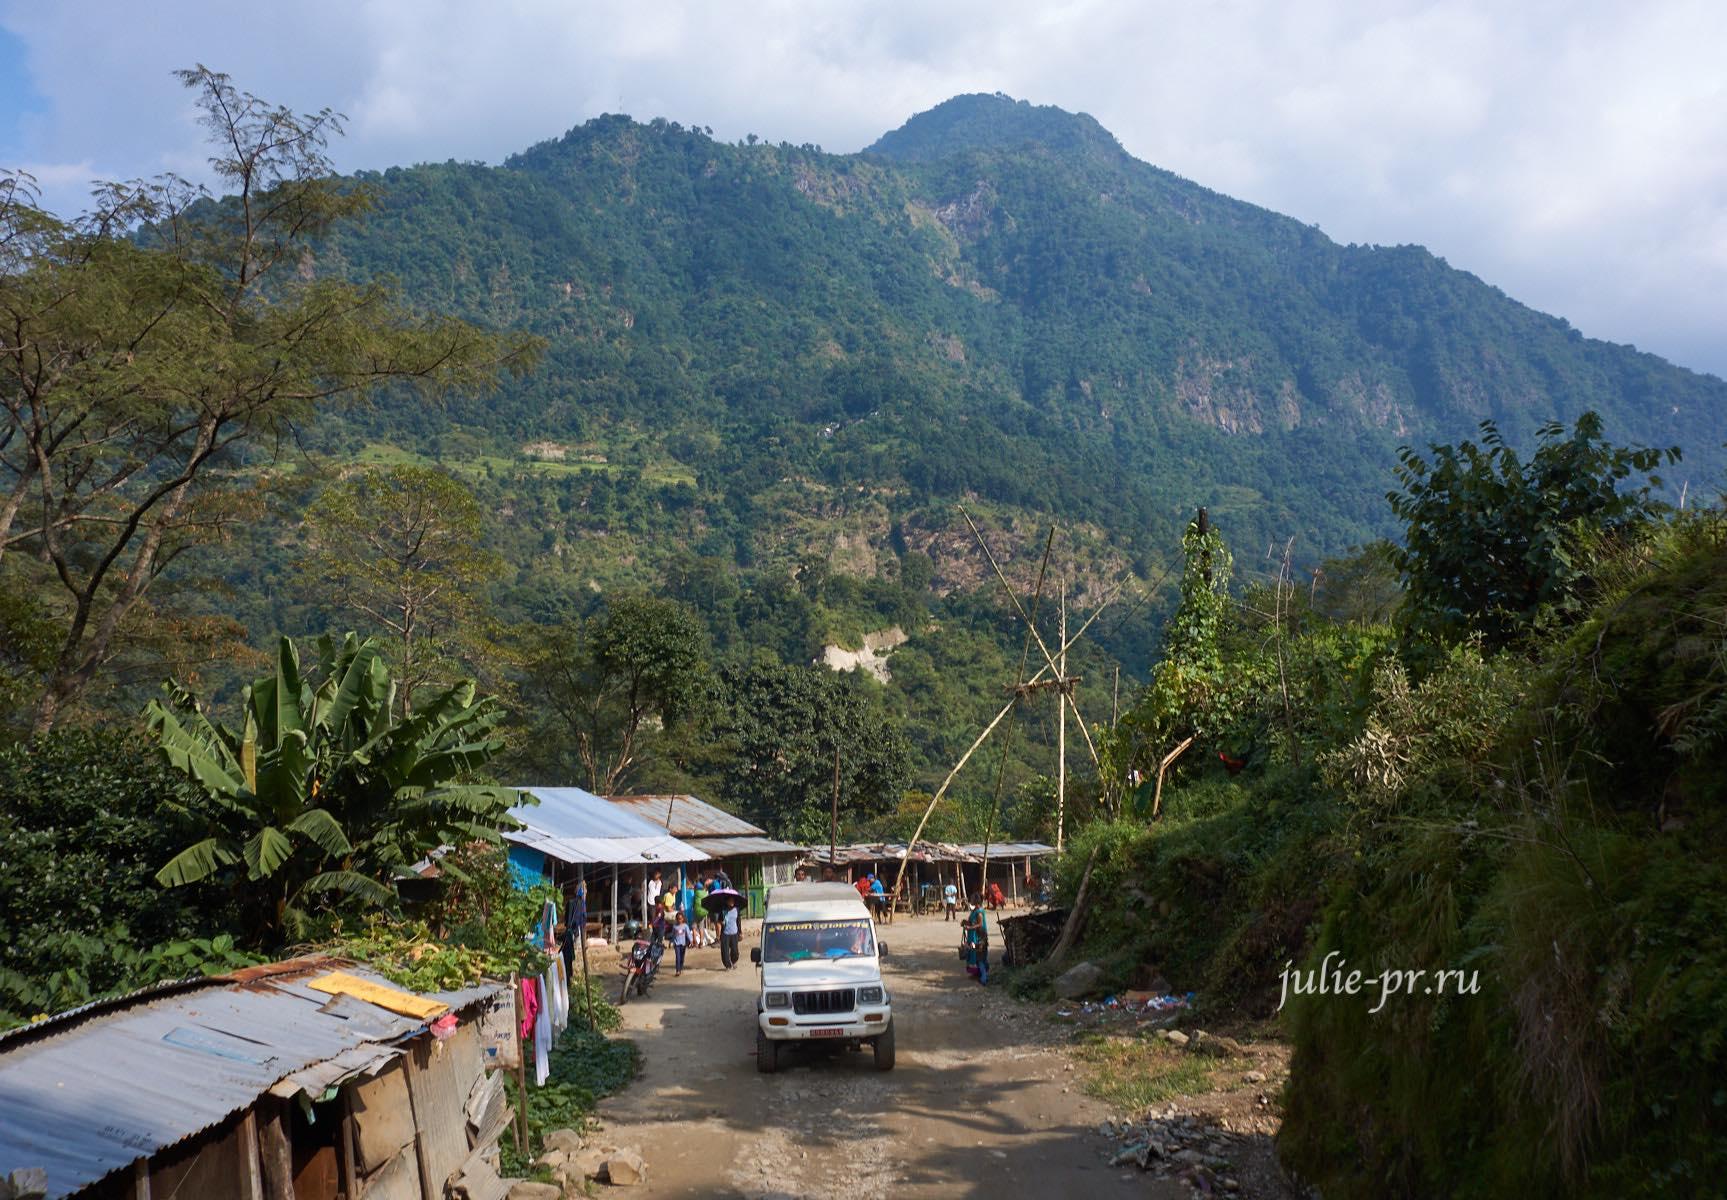 Непал, Аннапурна, джип